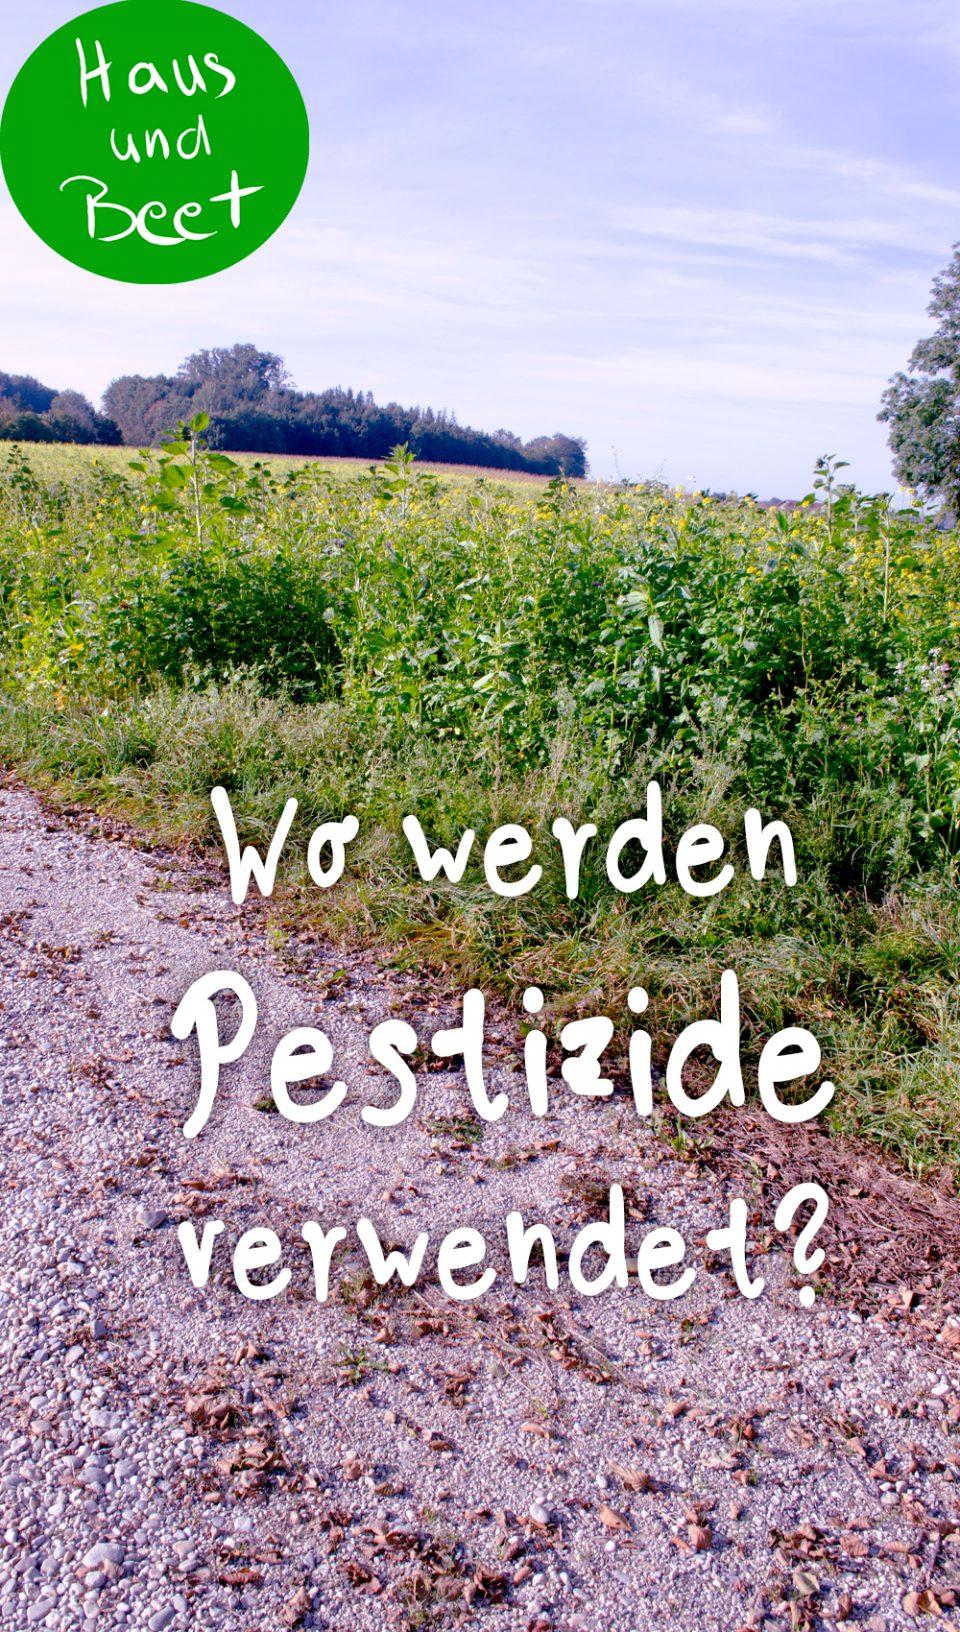 Pestizide Definition